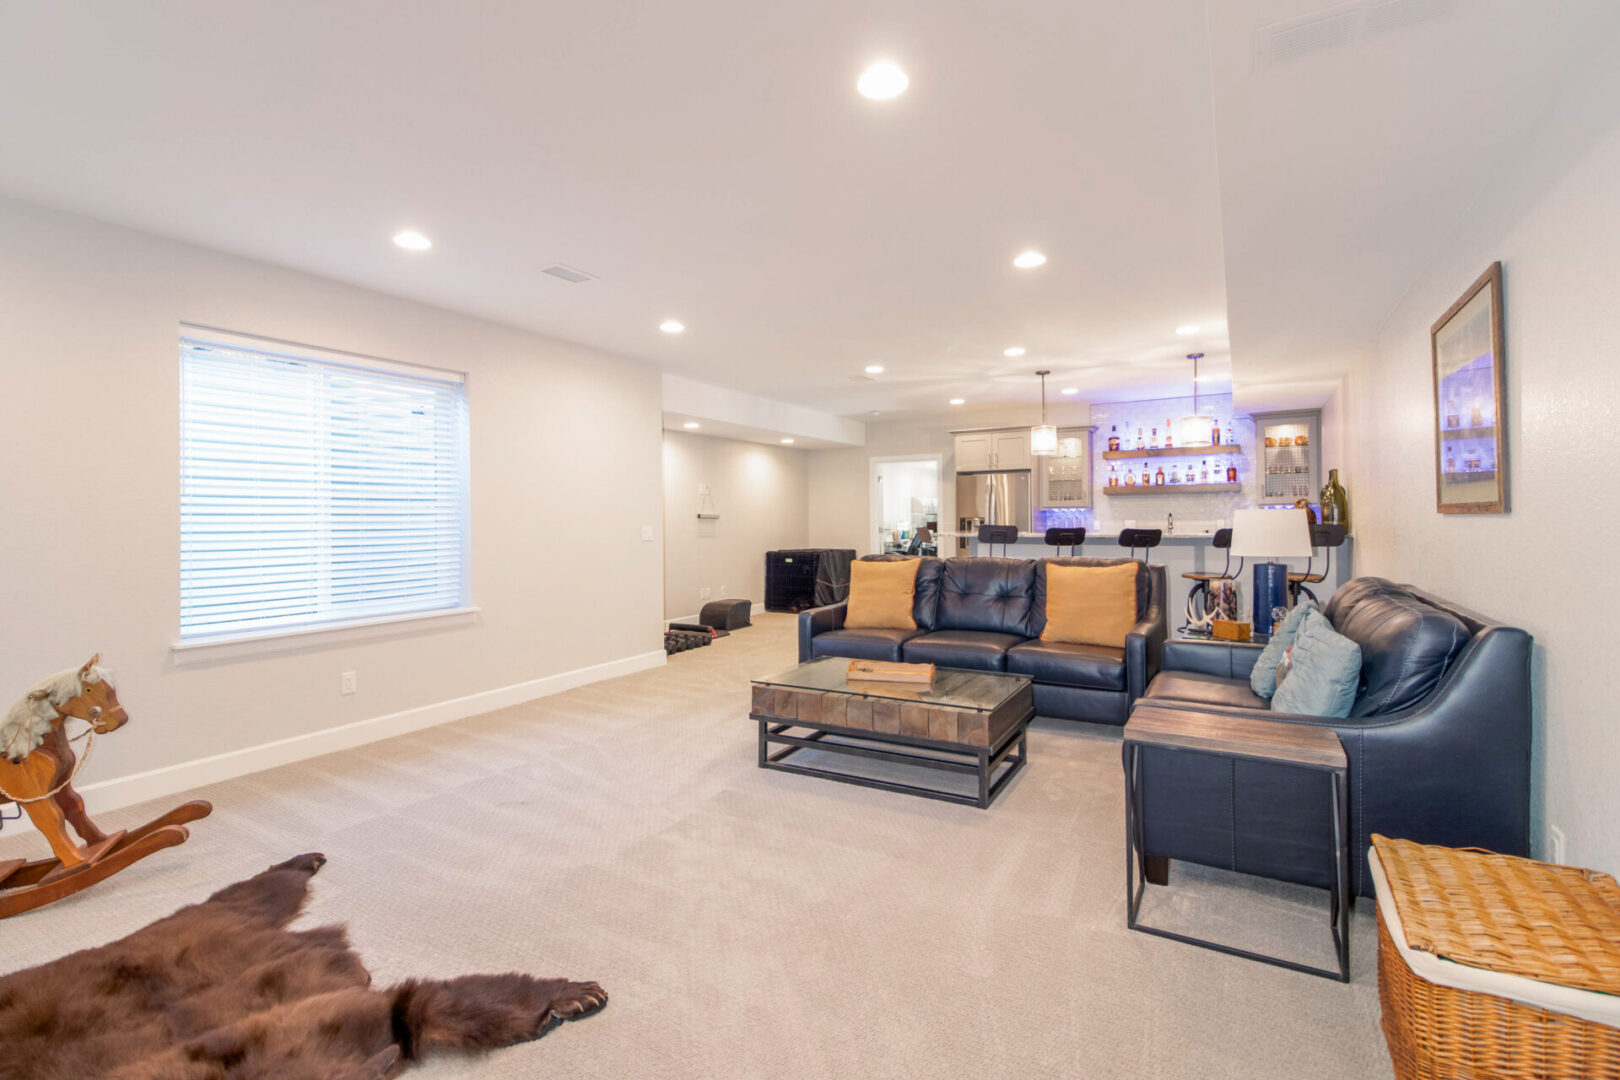 living room with bear fur carpet and modern lighting